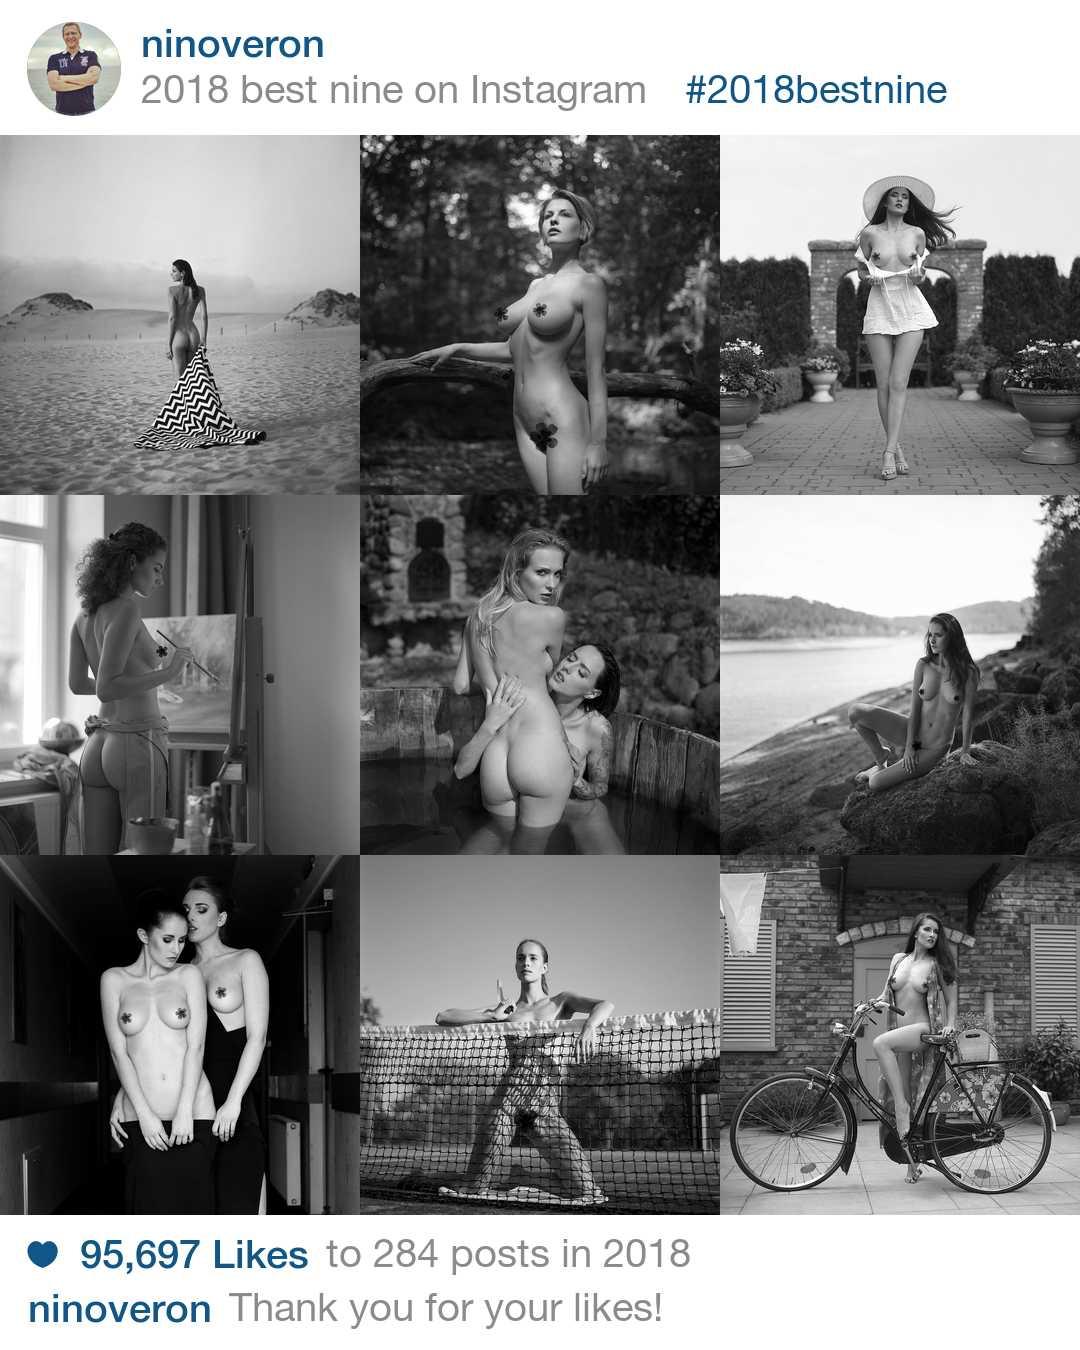 foto, instagram, ninoveron, akt, nude, analog, women. bestnine